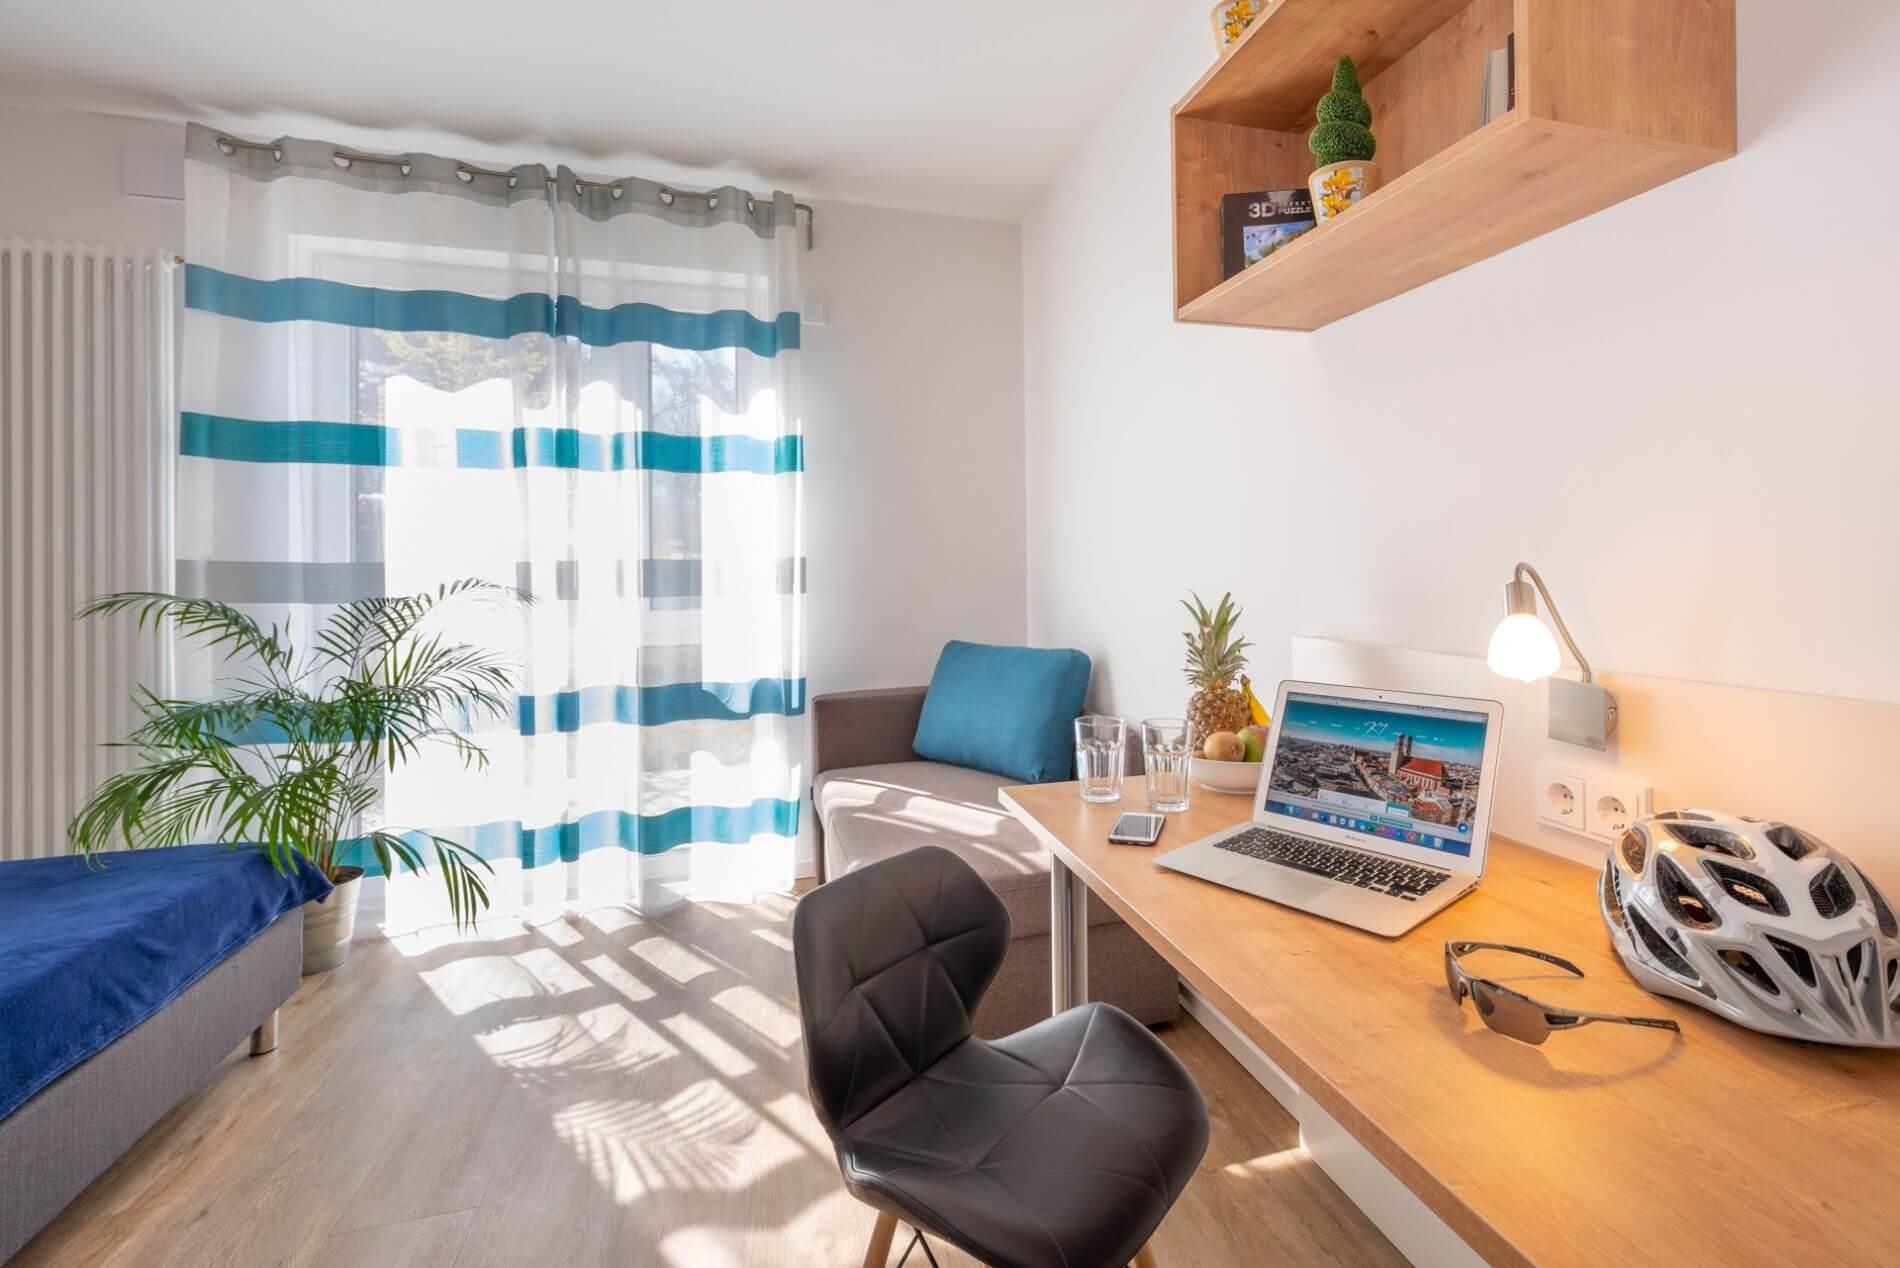 Studio for rent in Munich